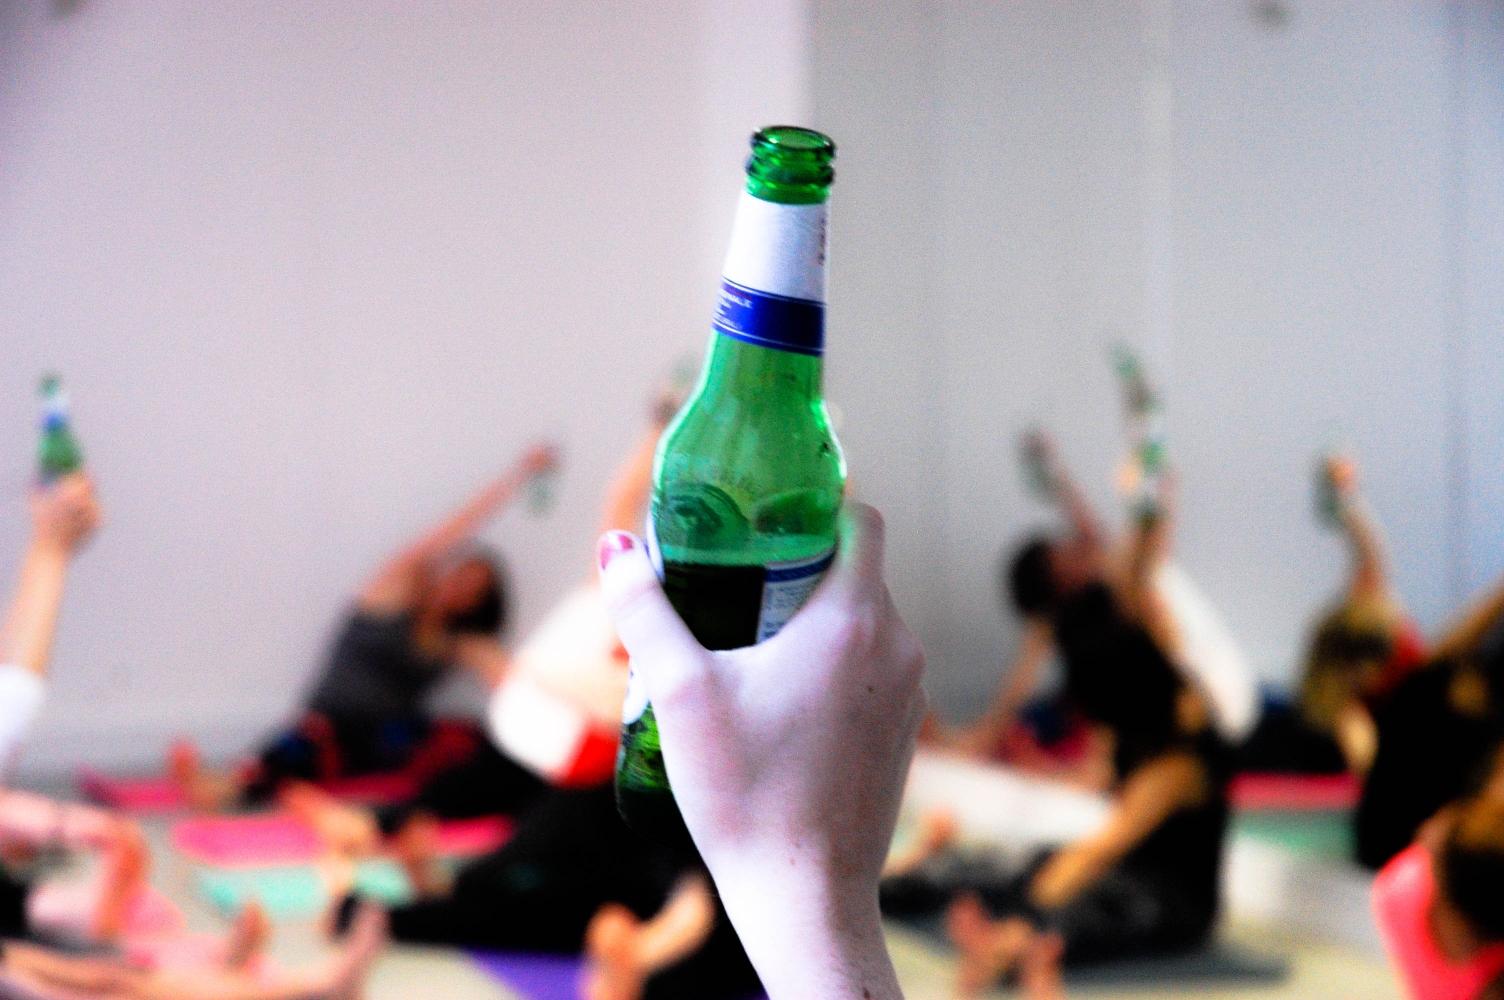 2017 09 02 Beer Yoga 2 7 Of 1 6